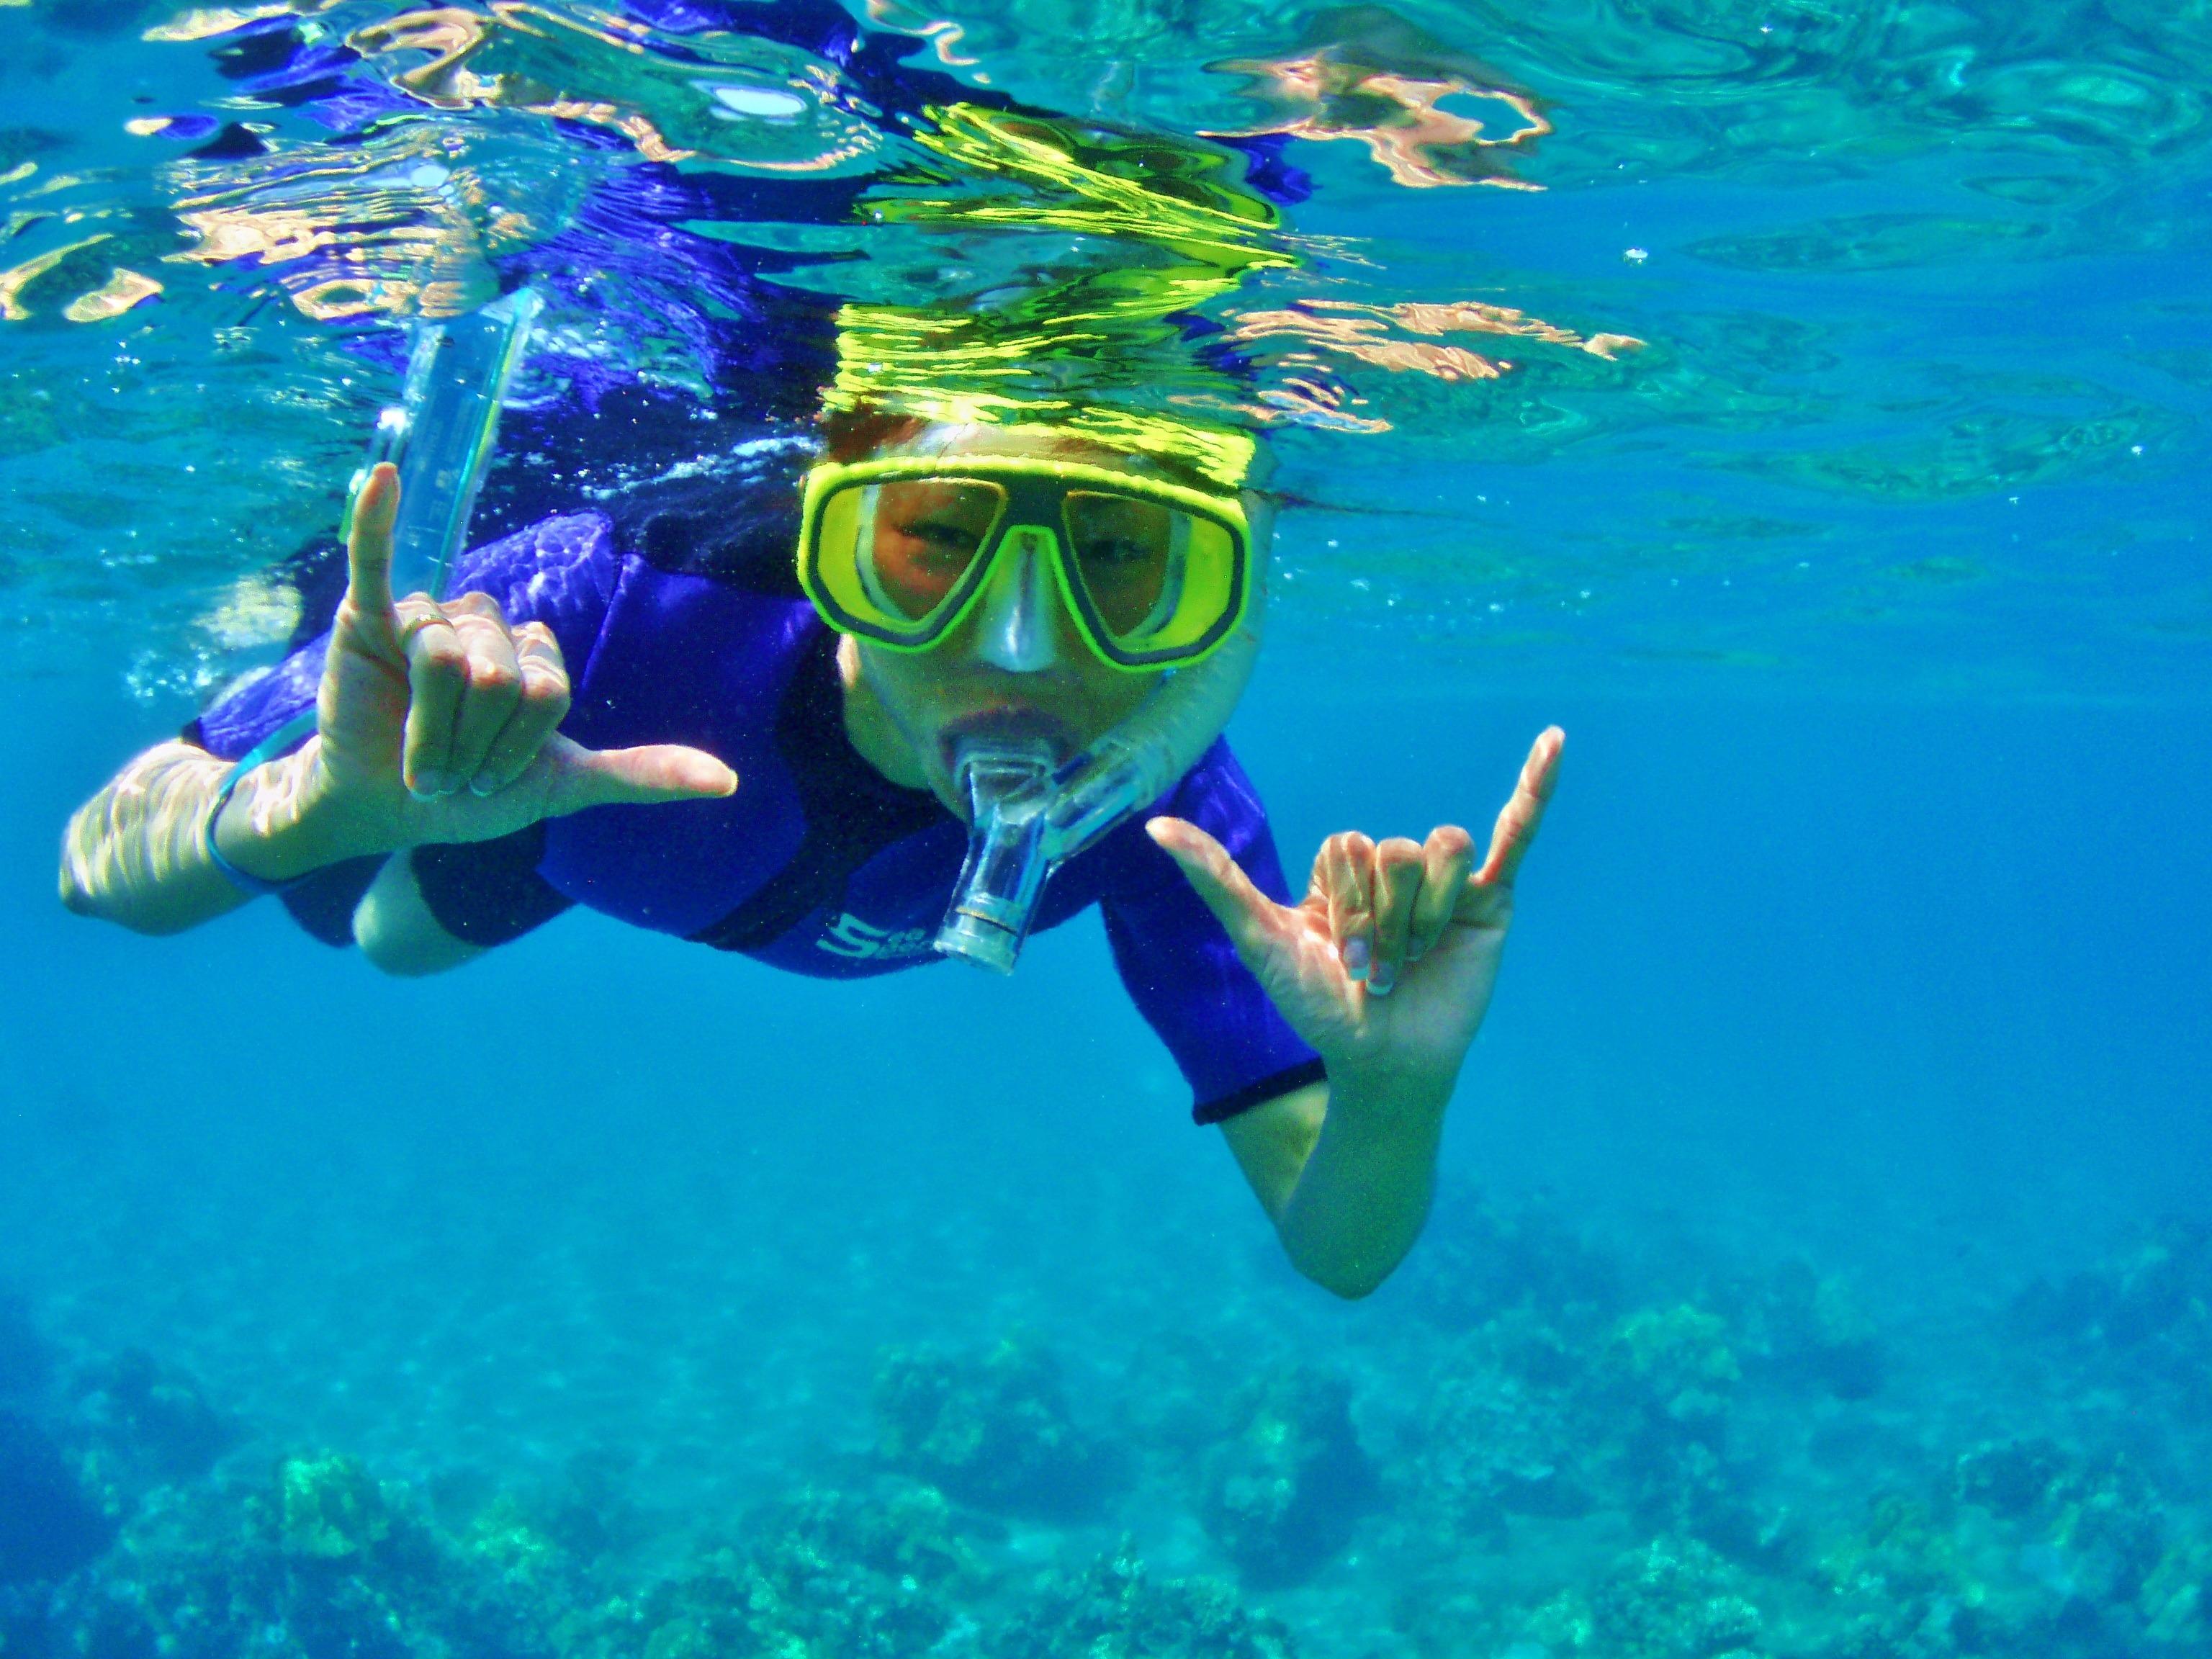 Shaka-snorkeler.jpg